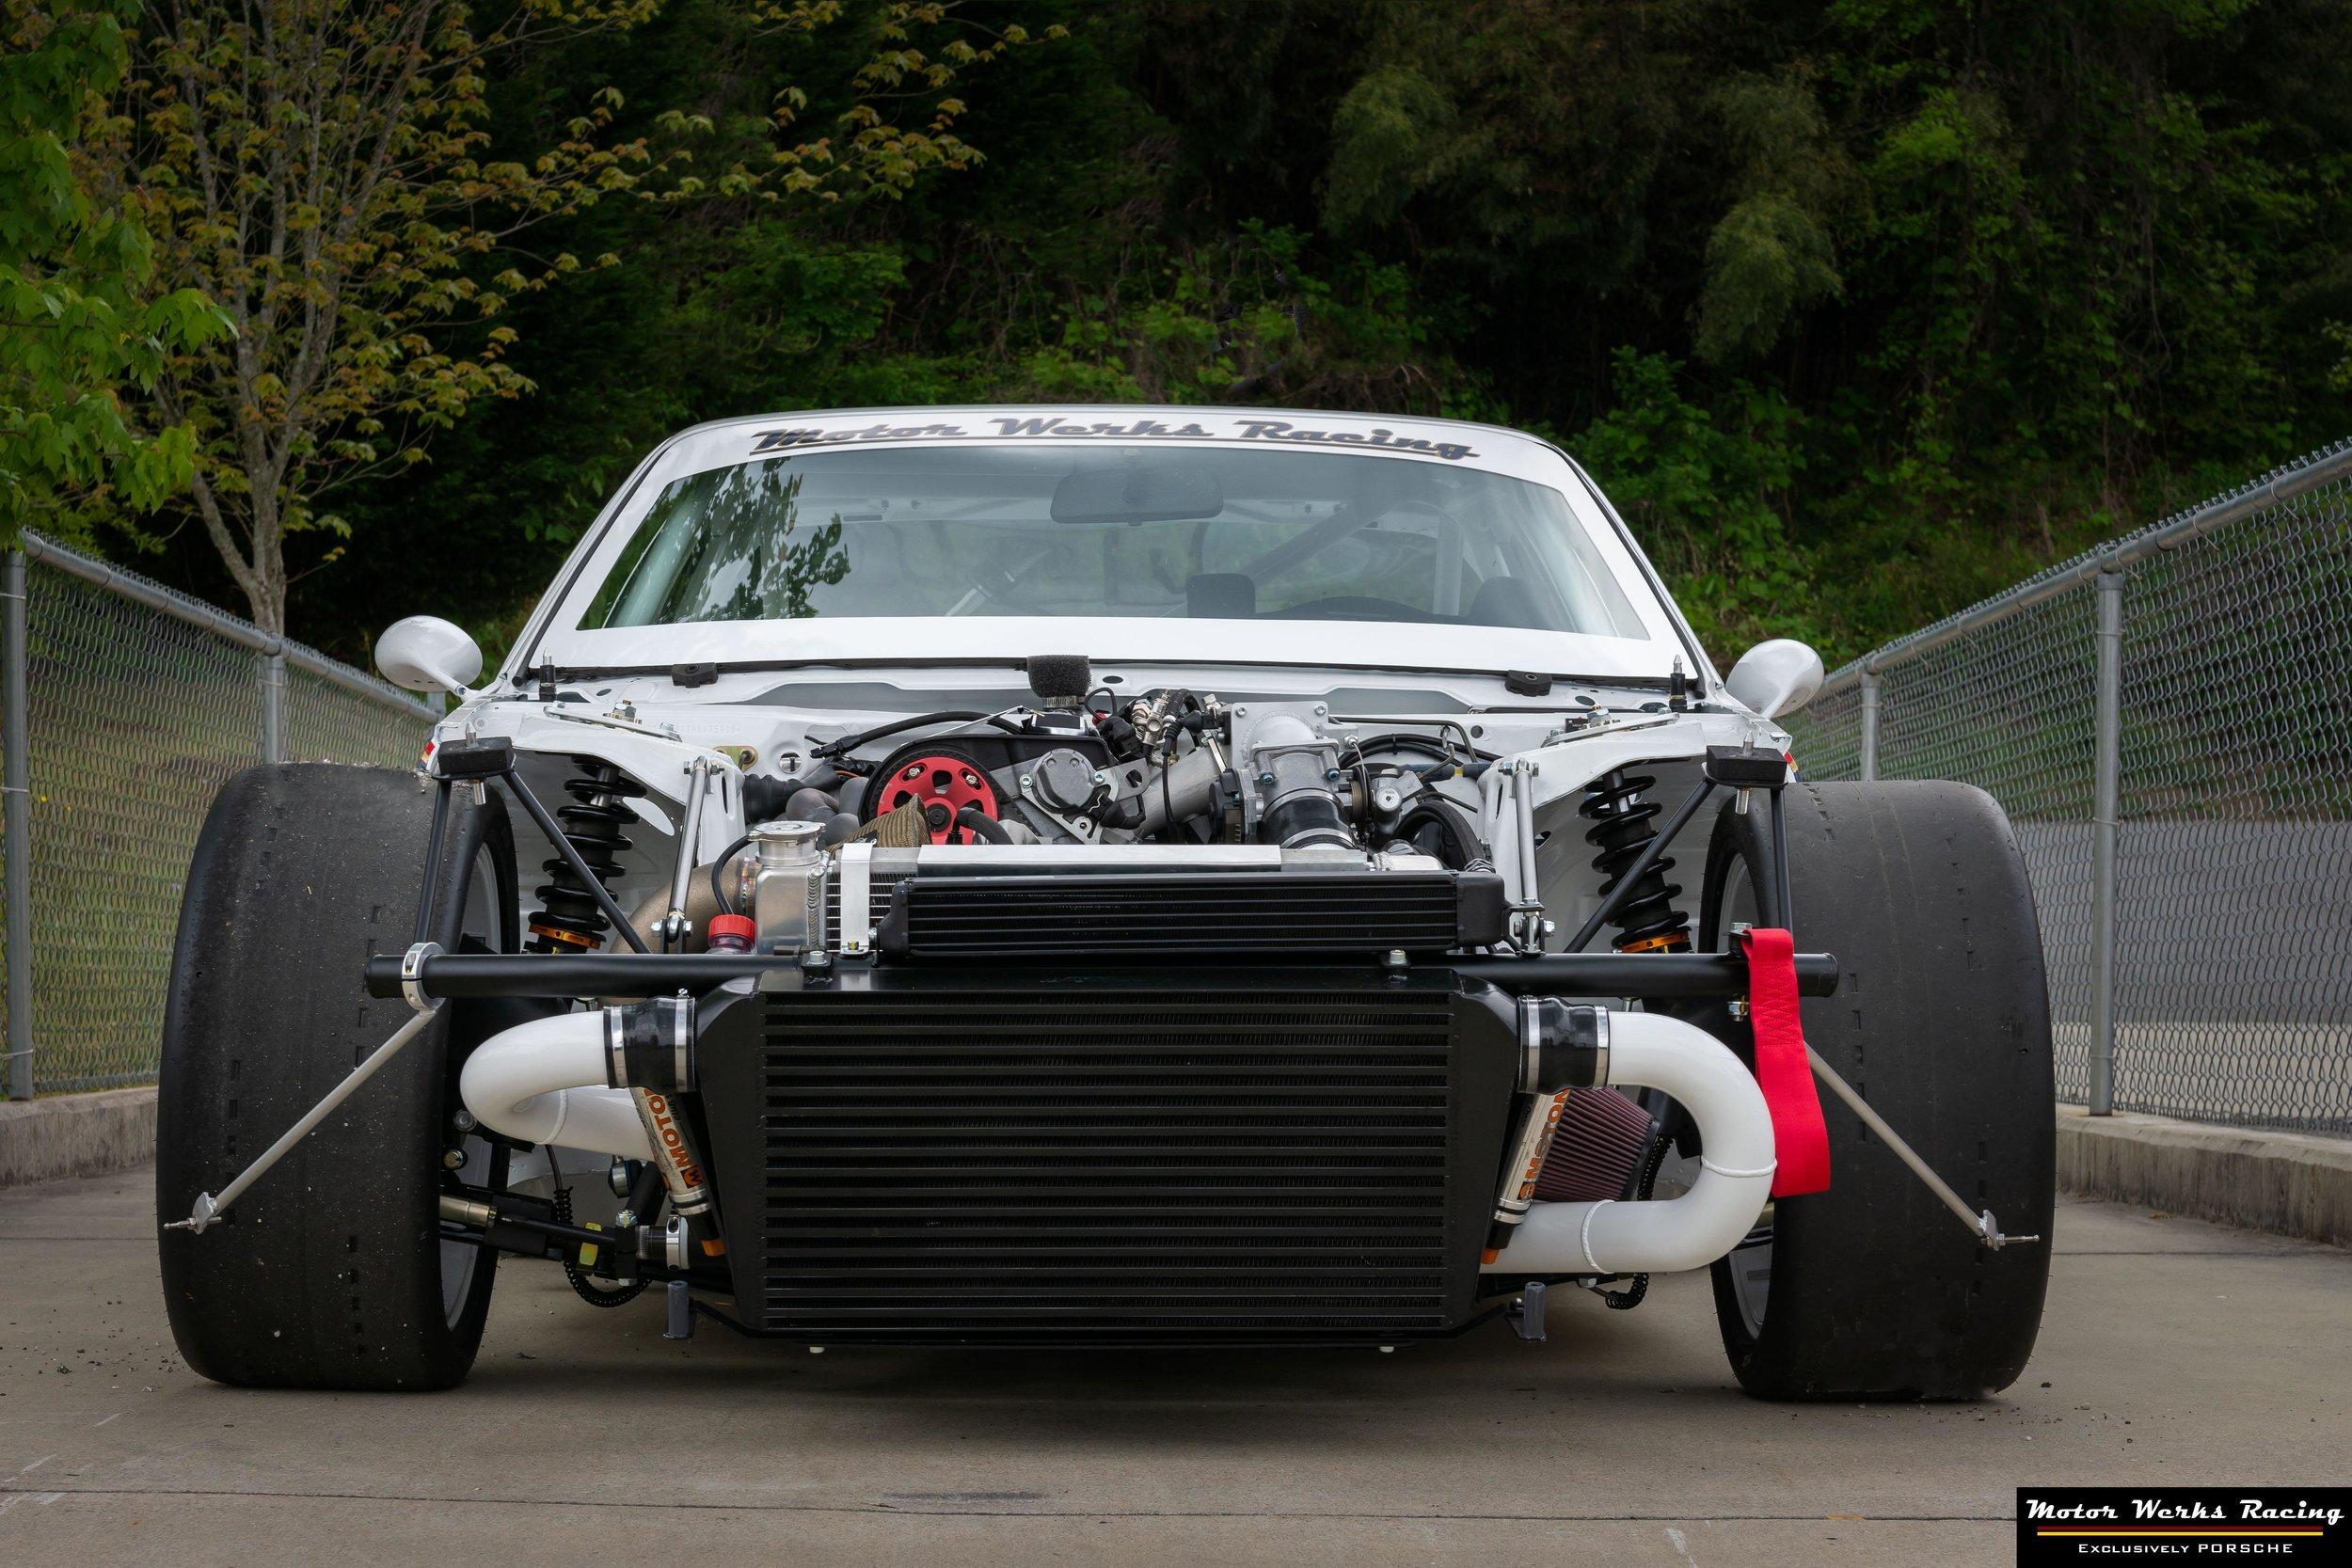 Motor Werks Racing 1.8T Engine Conversion